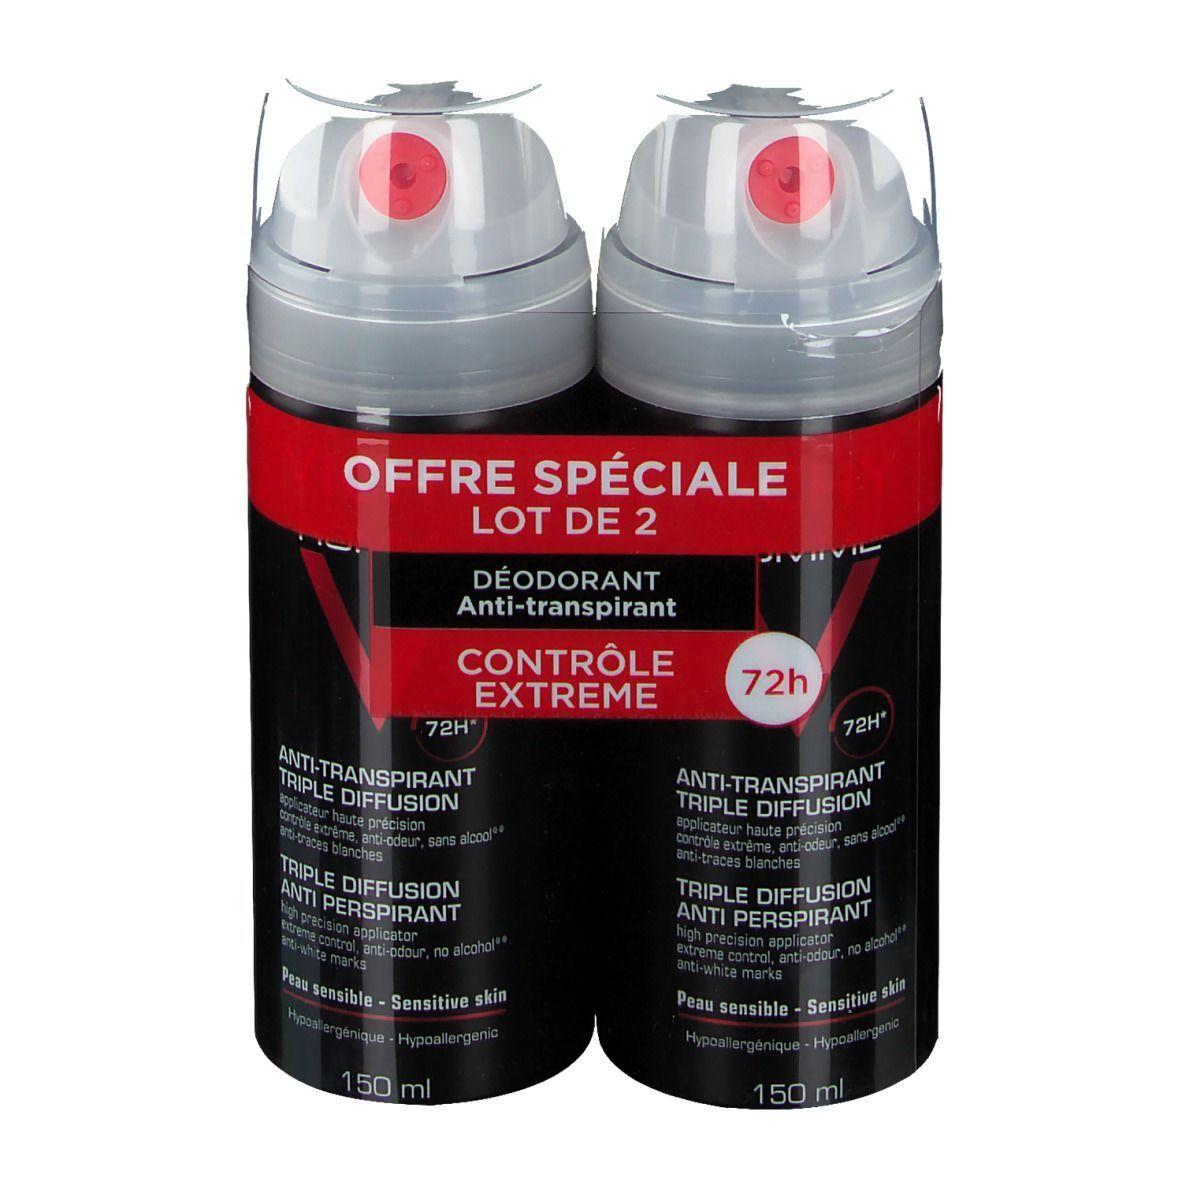 VICHY Homme déodorant antitranspirant triple diffusion ml déodorant